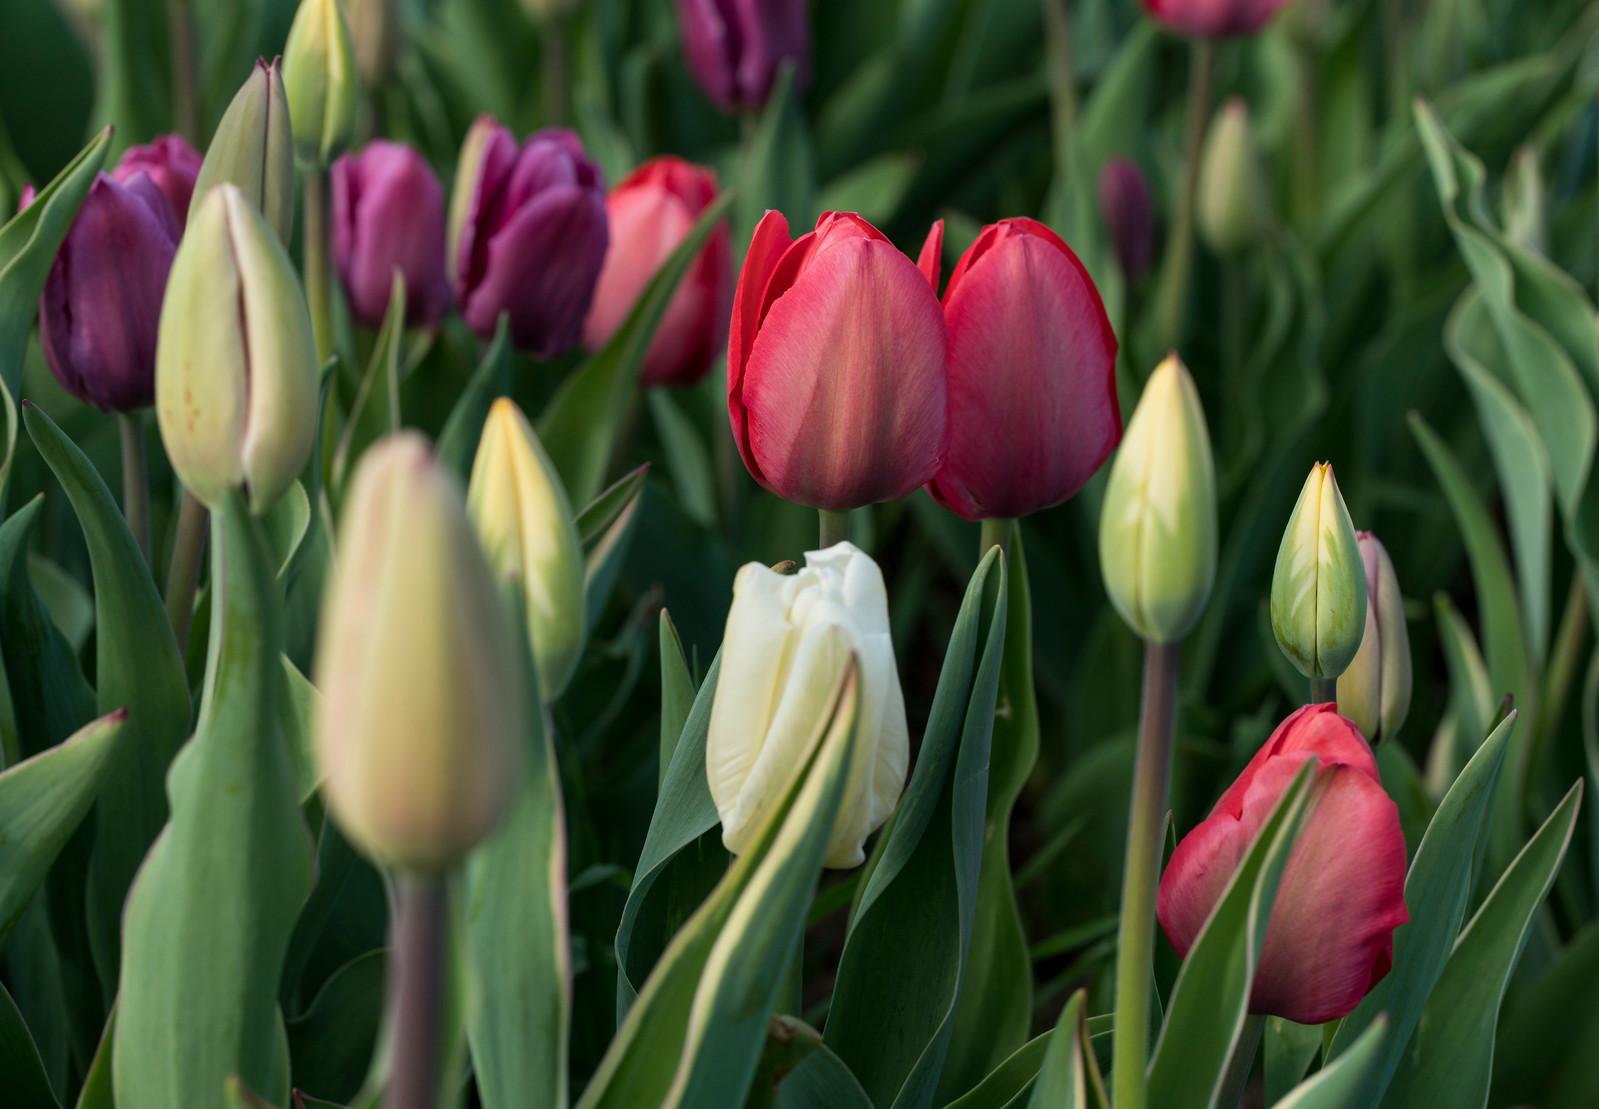 Multi-Colored Wicked Tulips_7668